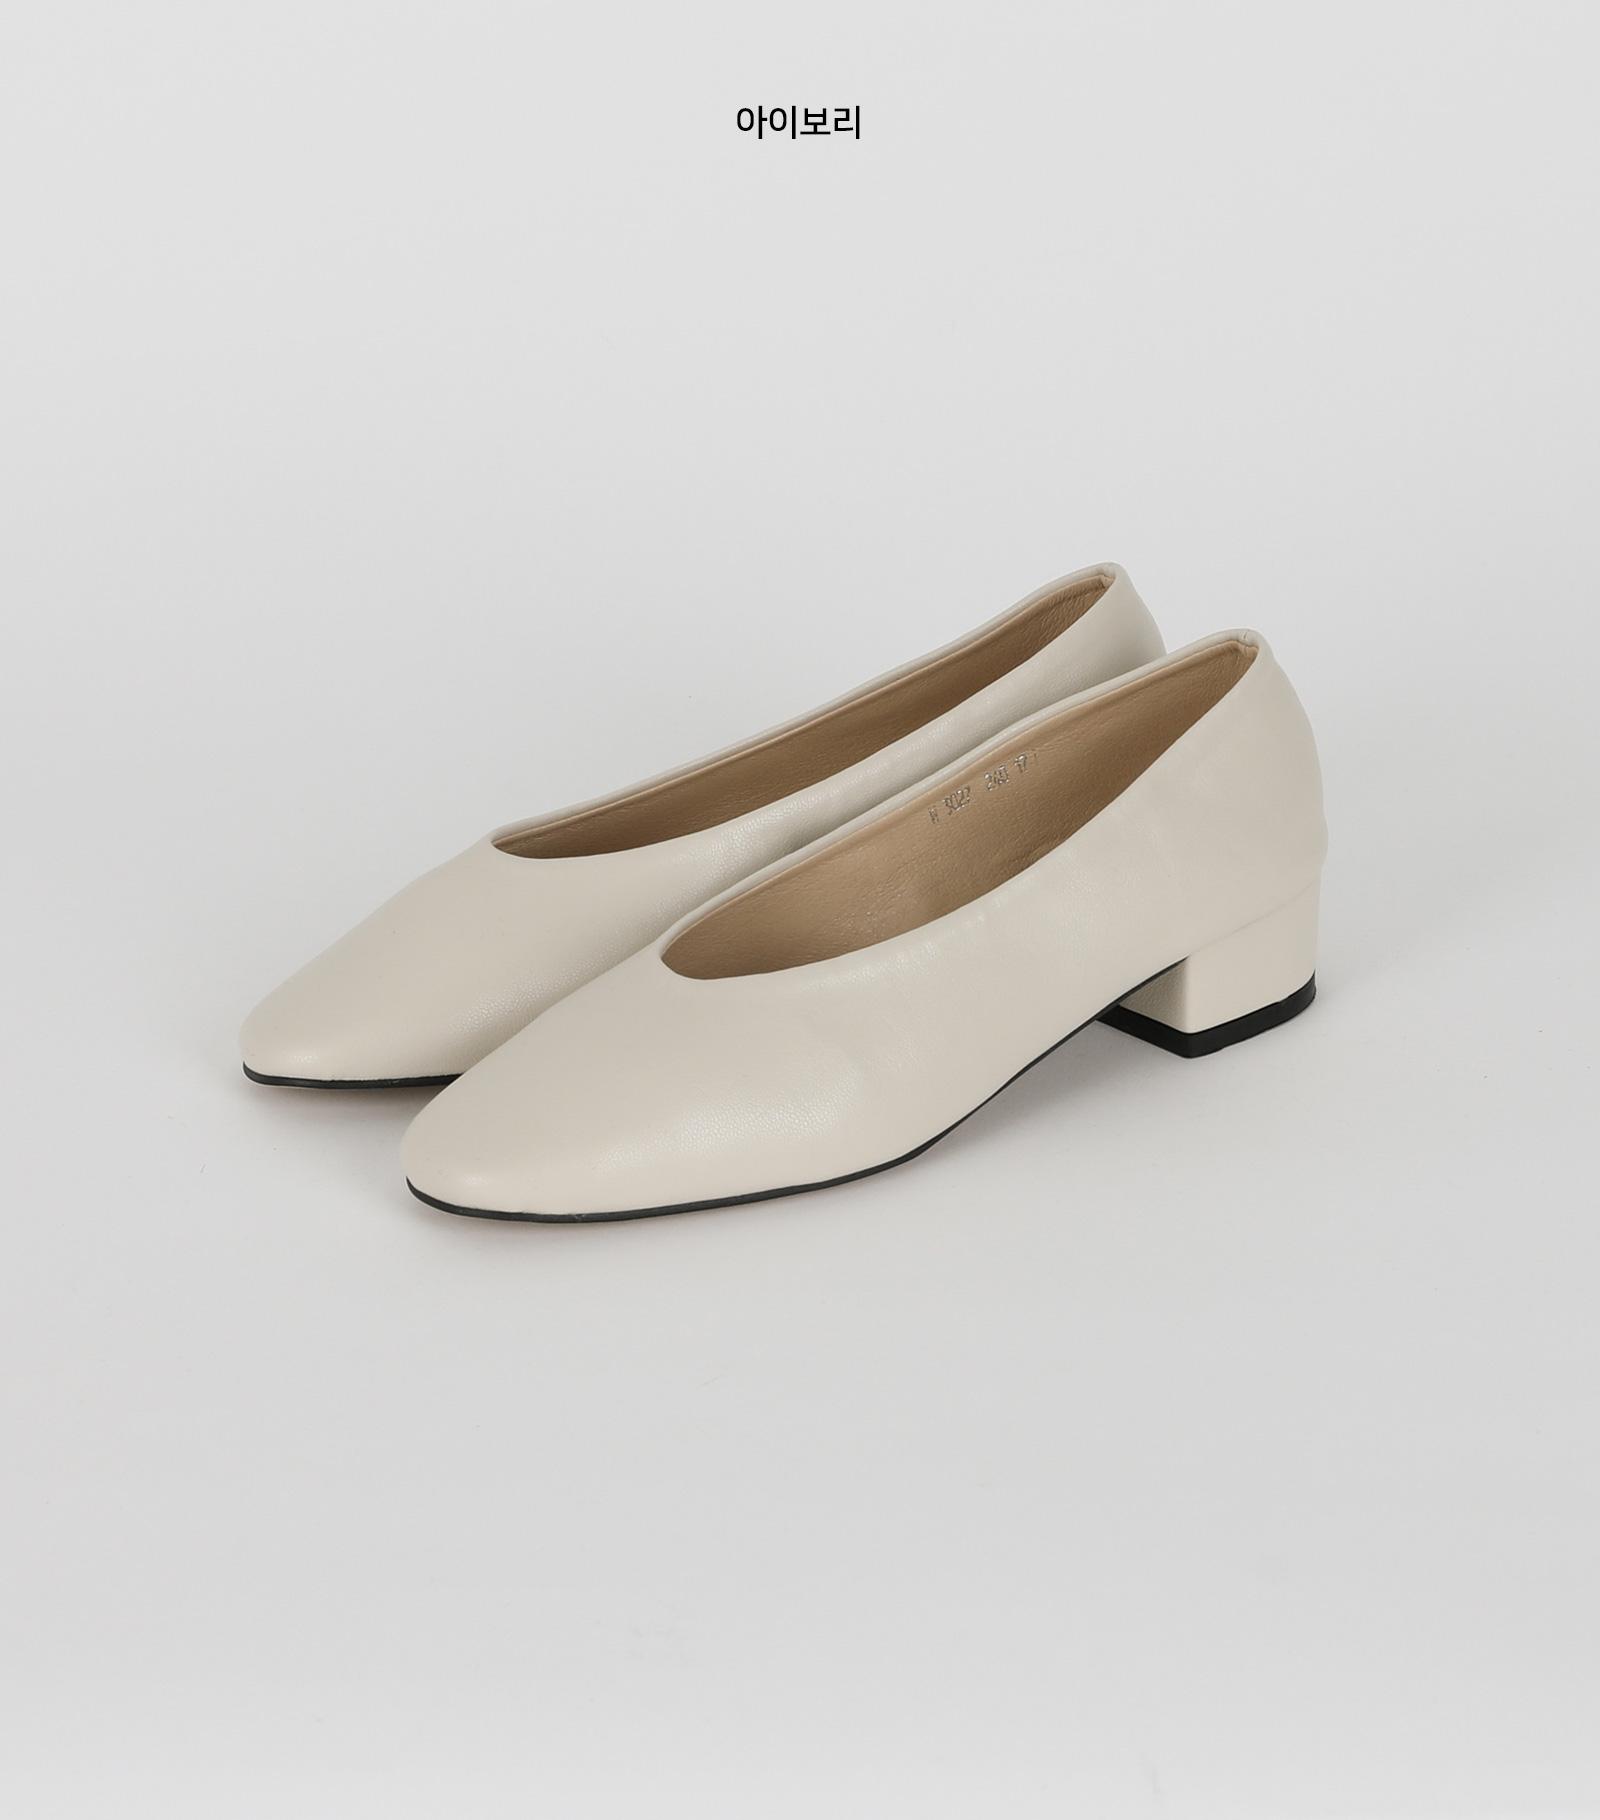 Alta Basic Low Heel Pumps